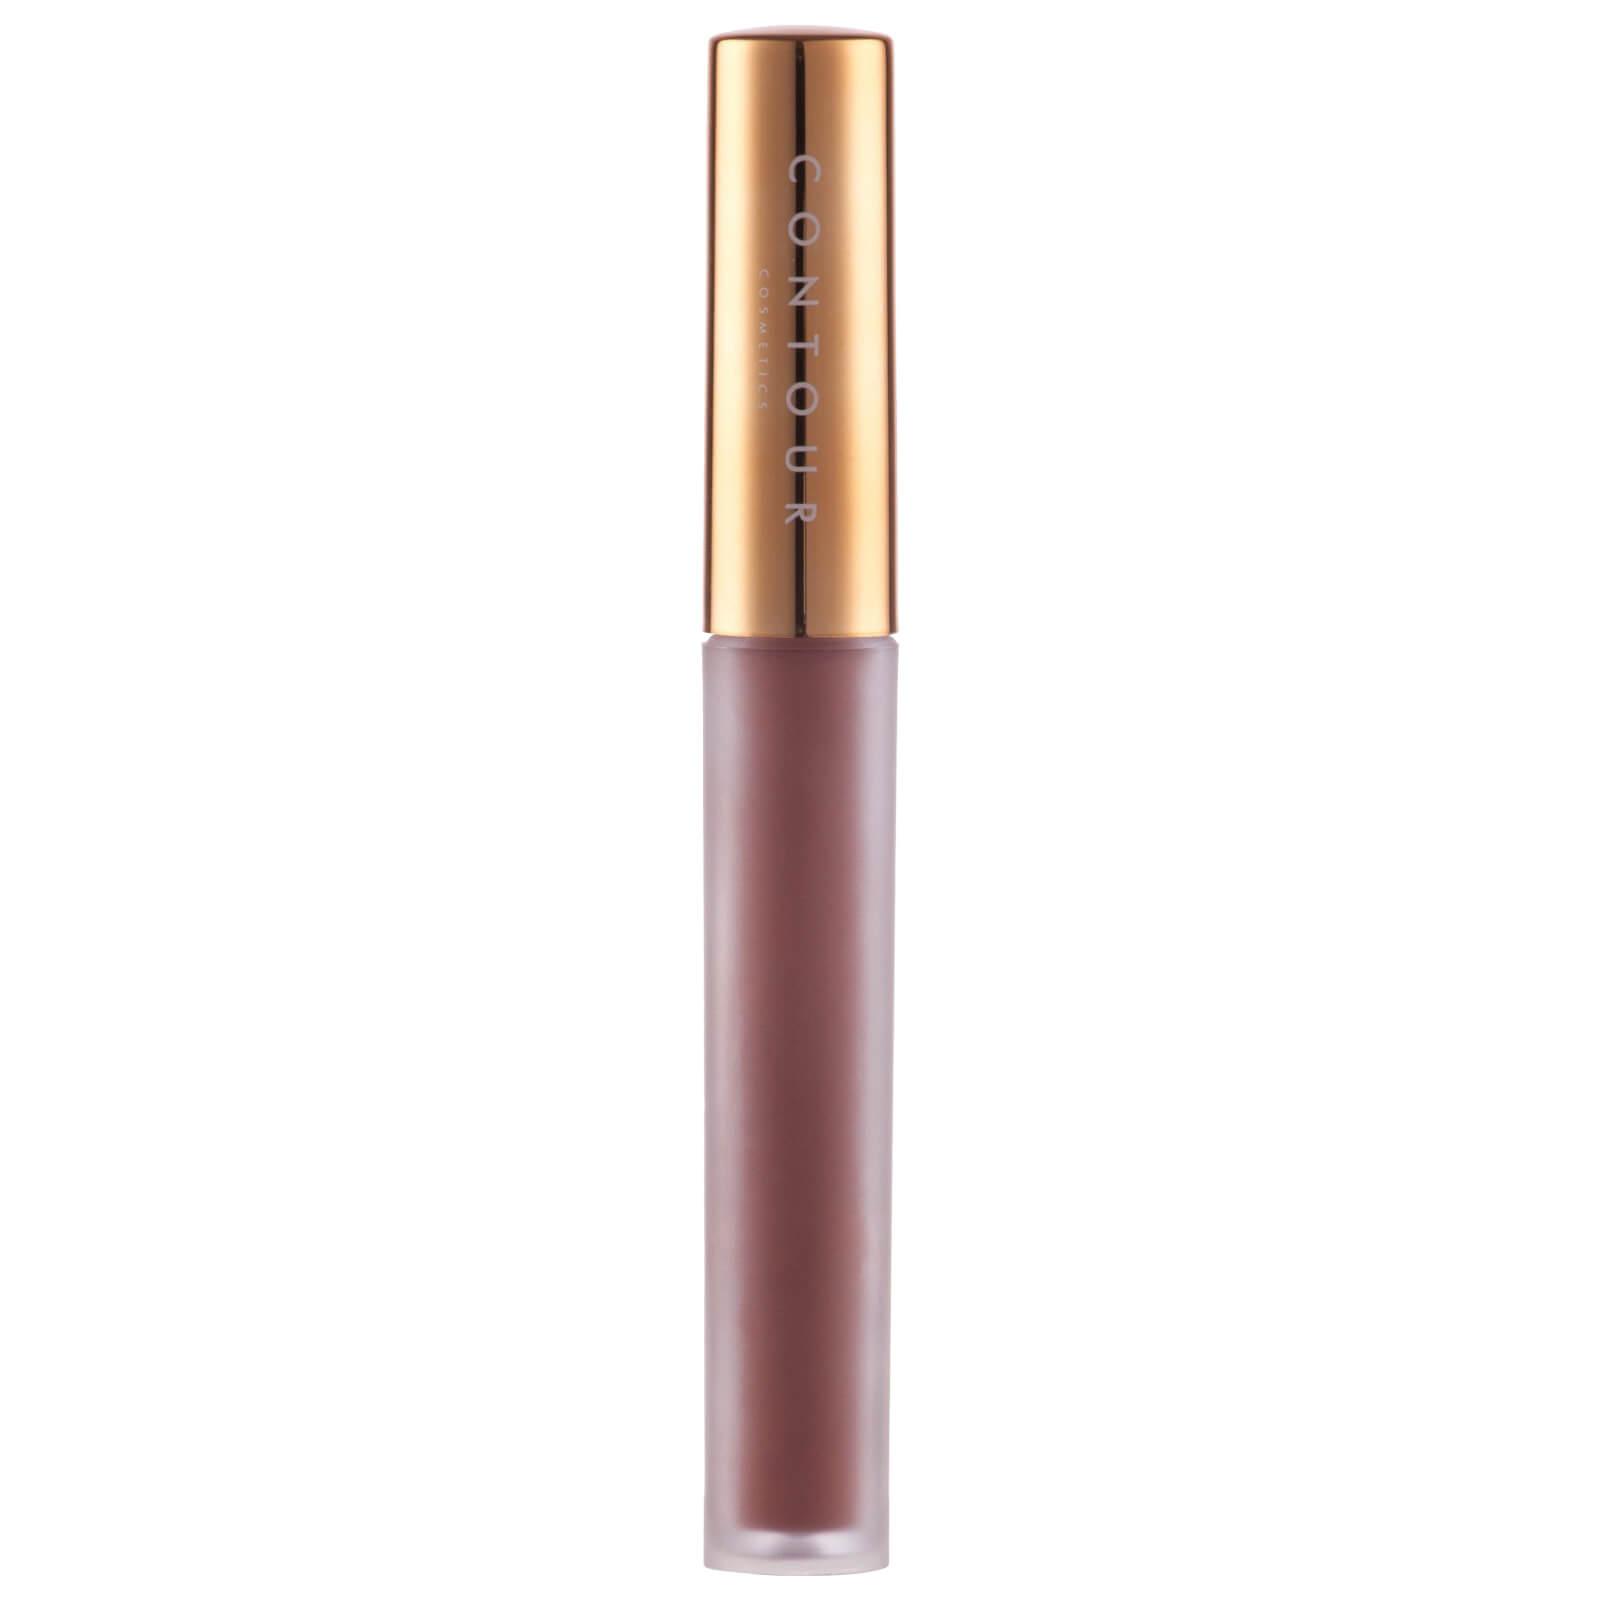 Glossy Box coupon: CONTOUR COSMETICS Matte Liquid Lipstick in JU JU